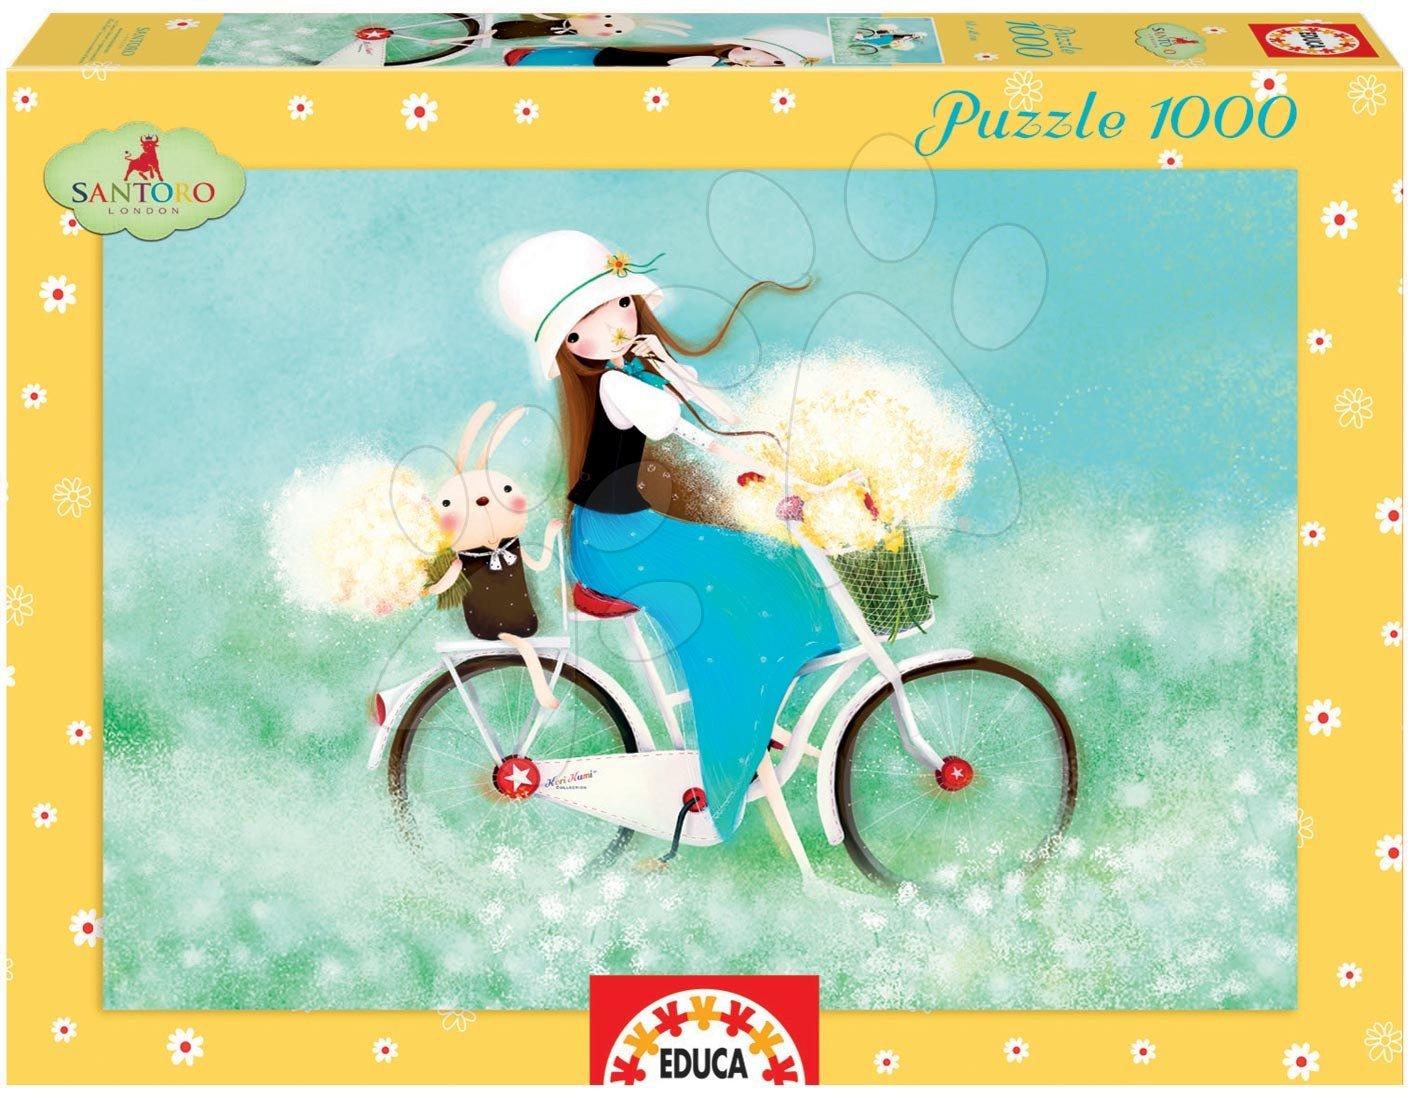 Puzzle Kori Kumi Summertime, Santoro Educa 1000 dílů od 12 let